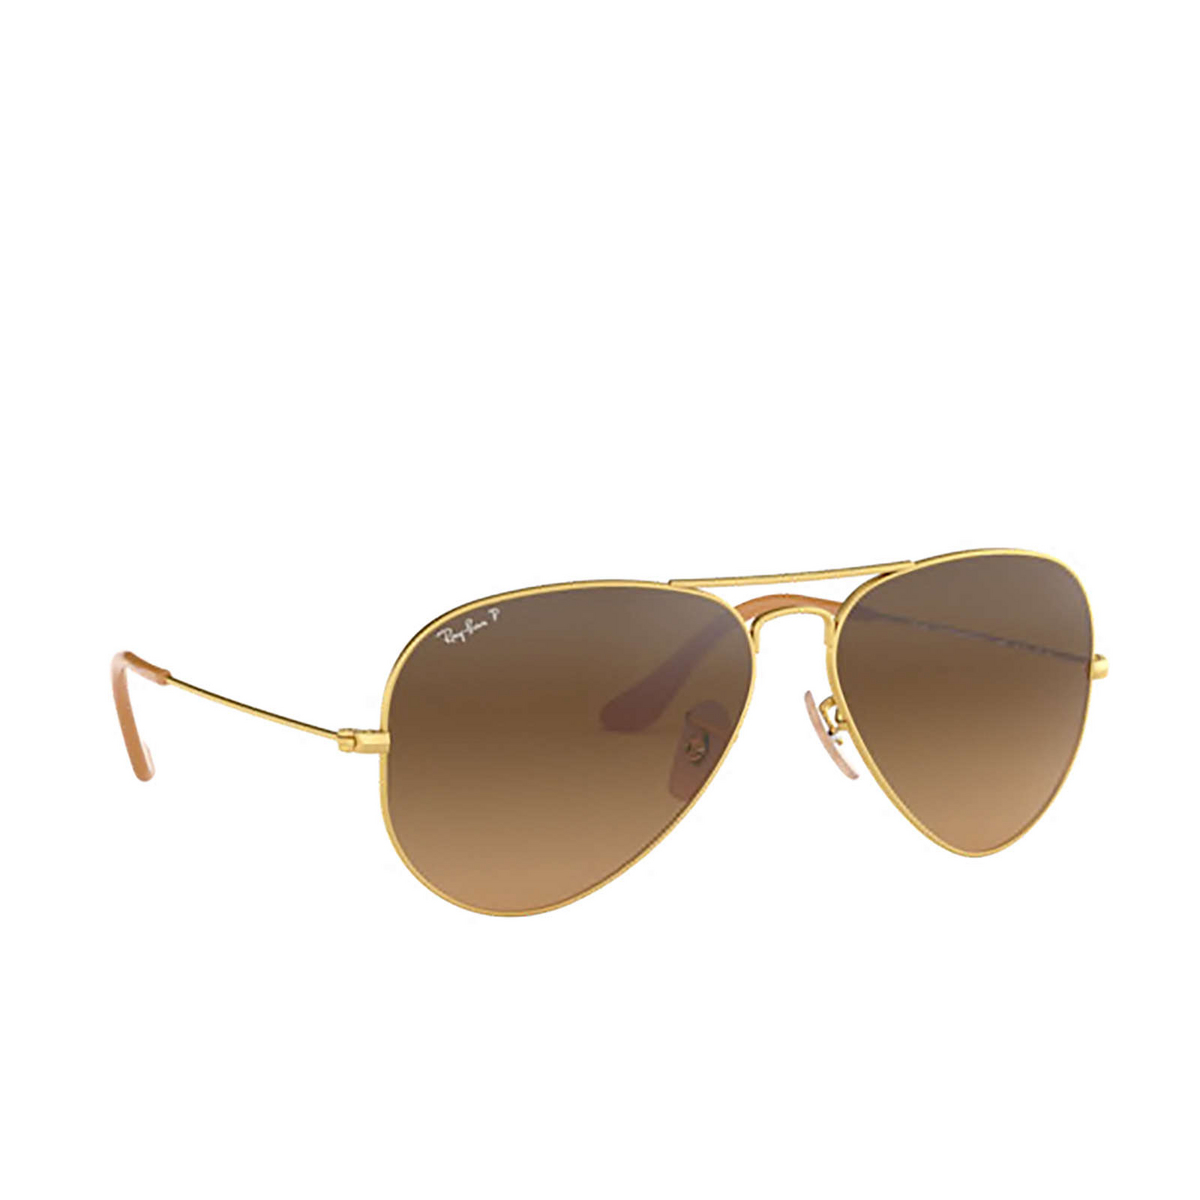 Ray-Ban® Aviator Sunglasses: Aviator Large Metal RB3025 color Matte Arista 112/M2 - three-quarters view.